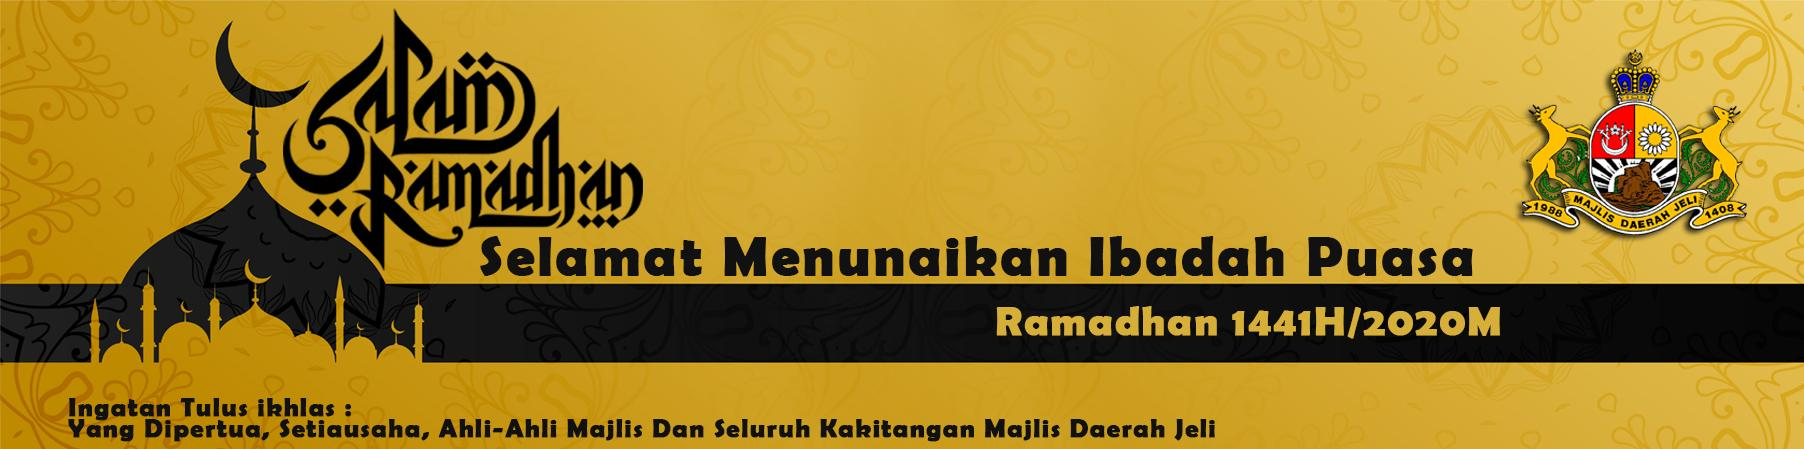 SALAM RAMADHAN 1441 HIJRAH / 2020 MASIHI